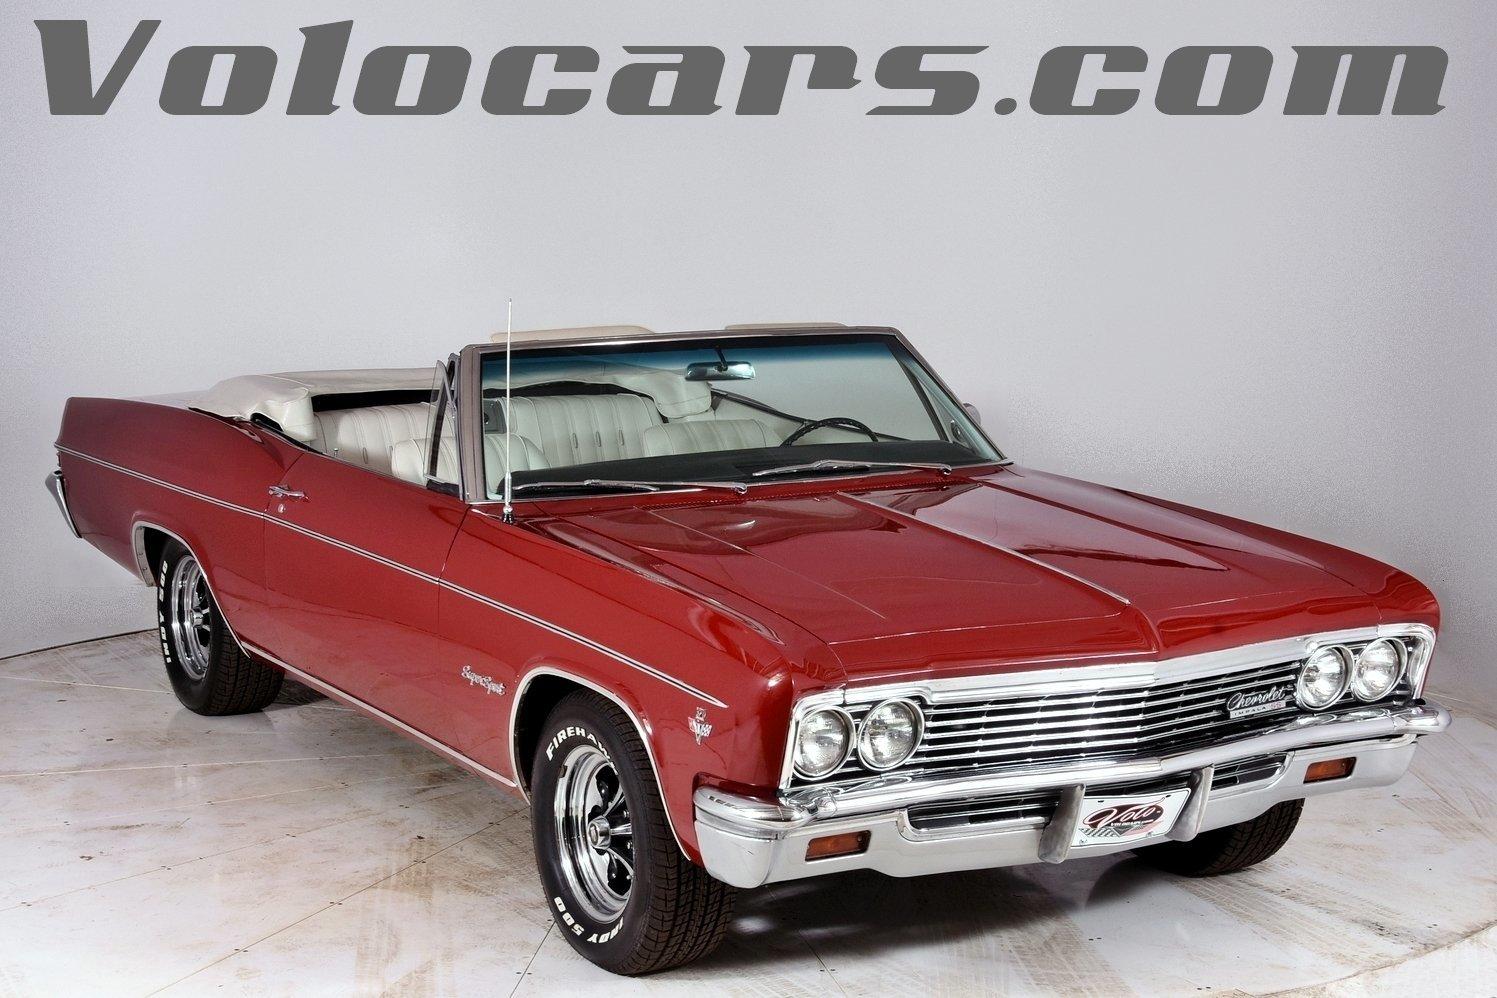 1966 Chevrolet Impala Volo Auto Museum Chevy Suspension